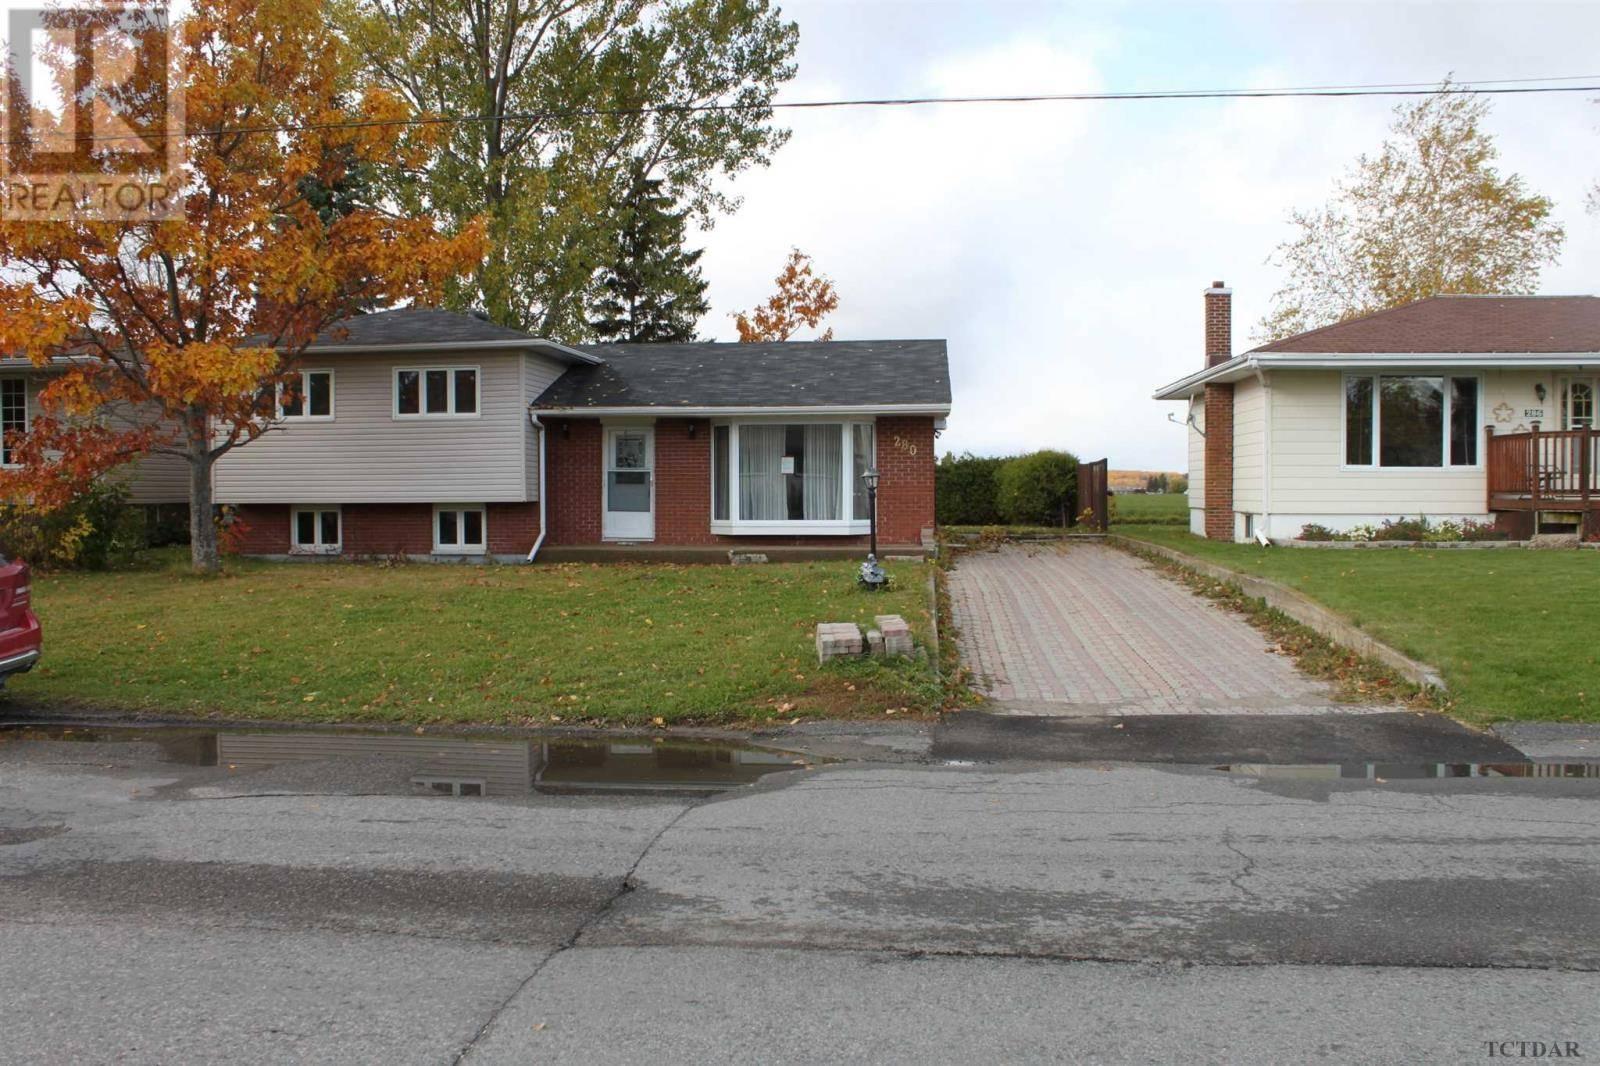 House for sale at 280 Mckelvie St Temiskaming Shores Ontario - MLS: TM200460